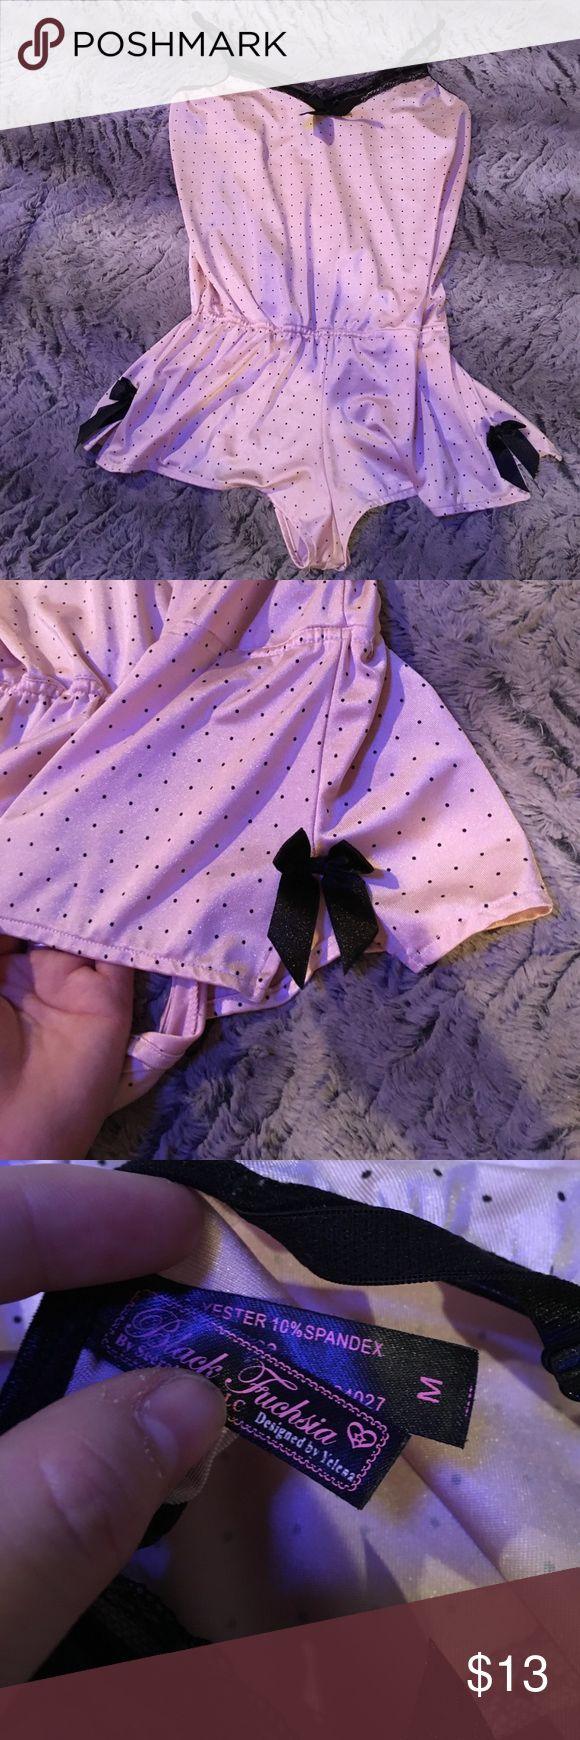 One piece sleeper Pink and polka dot one piece sleep wear super cute. New no tags sz medium. Intimates & Sleepwear Pajamas